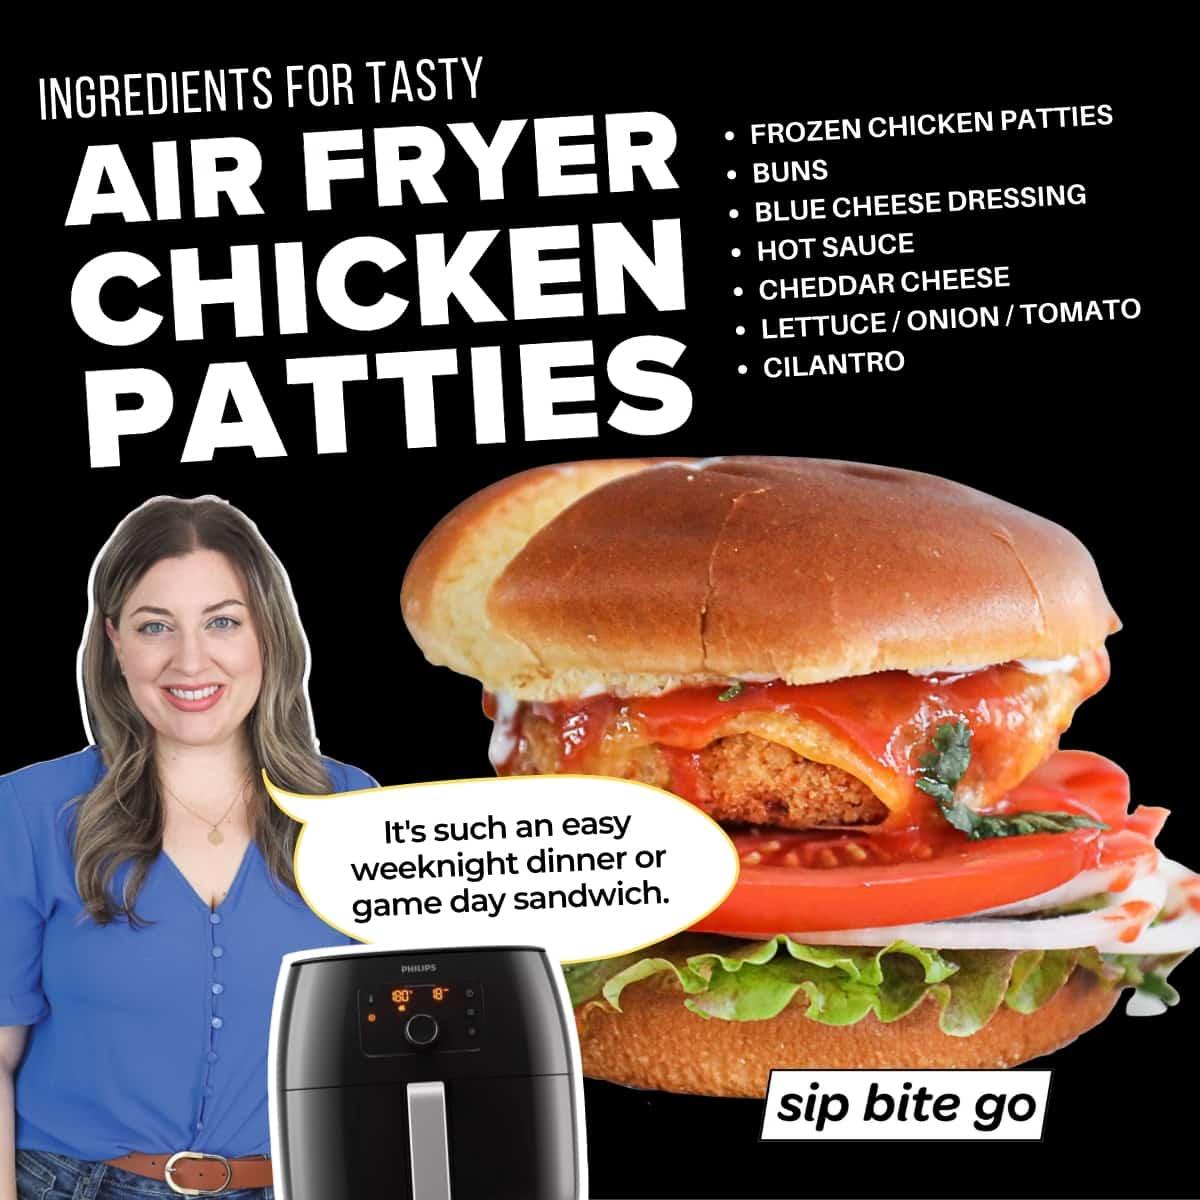 Infographic with ingredients for frozen air fryer chicken patties recipe